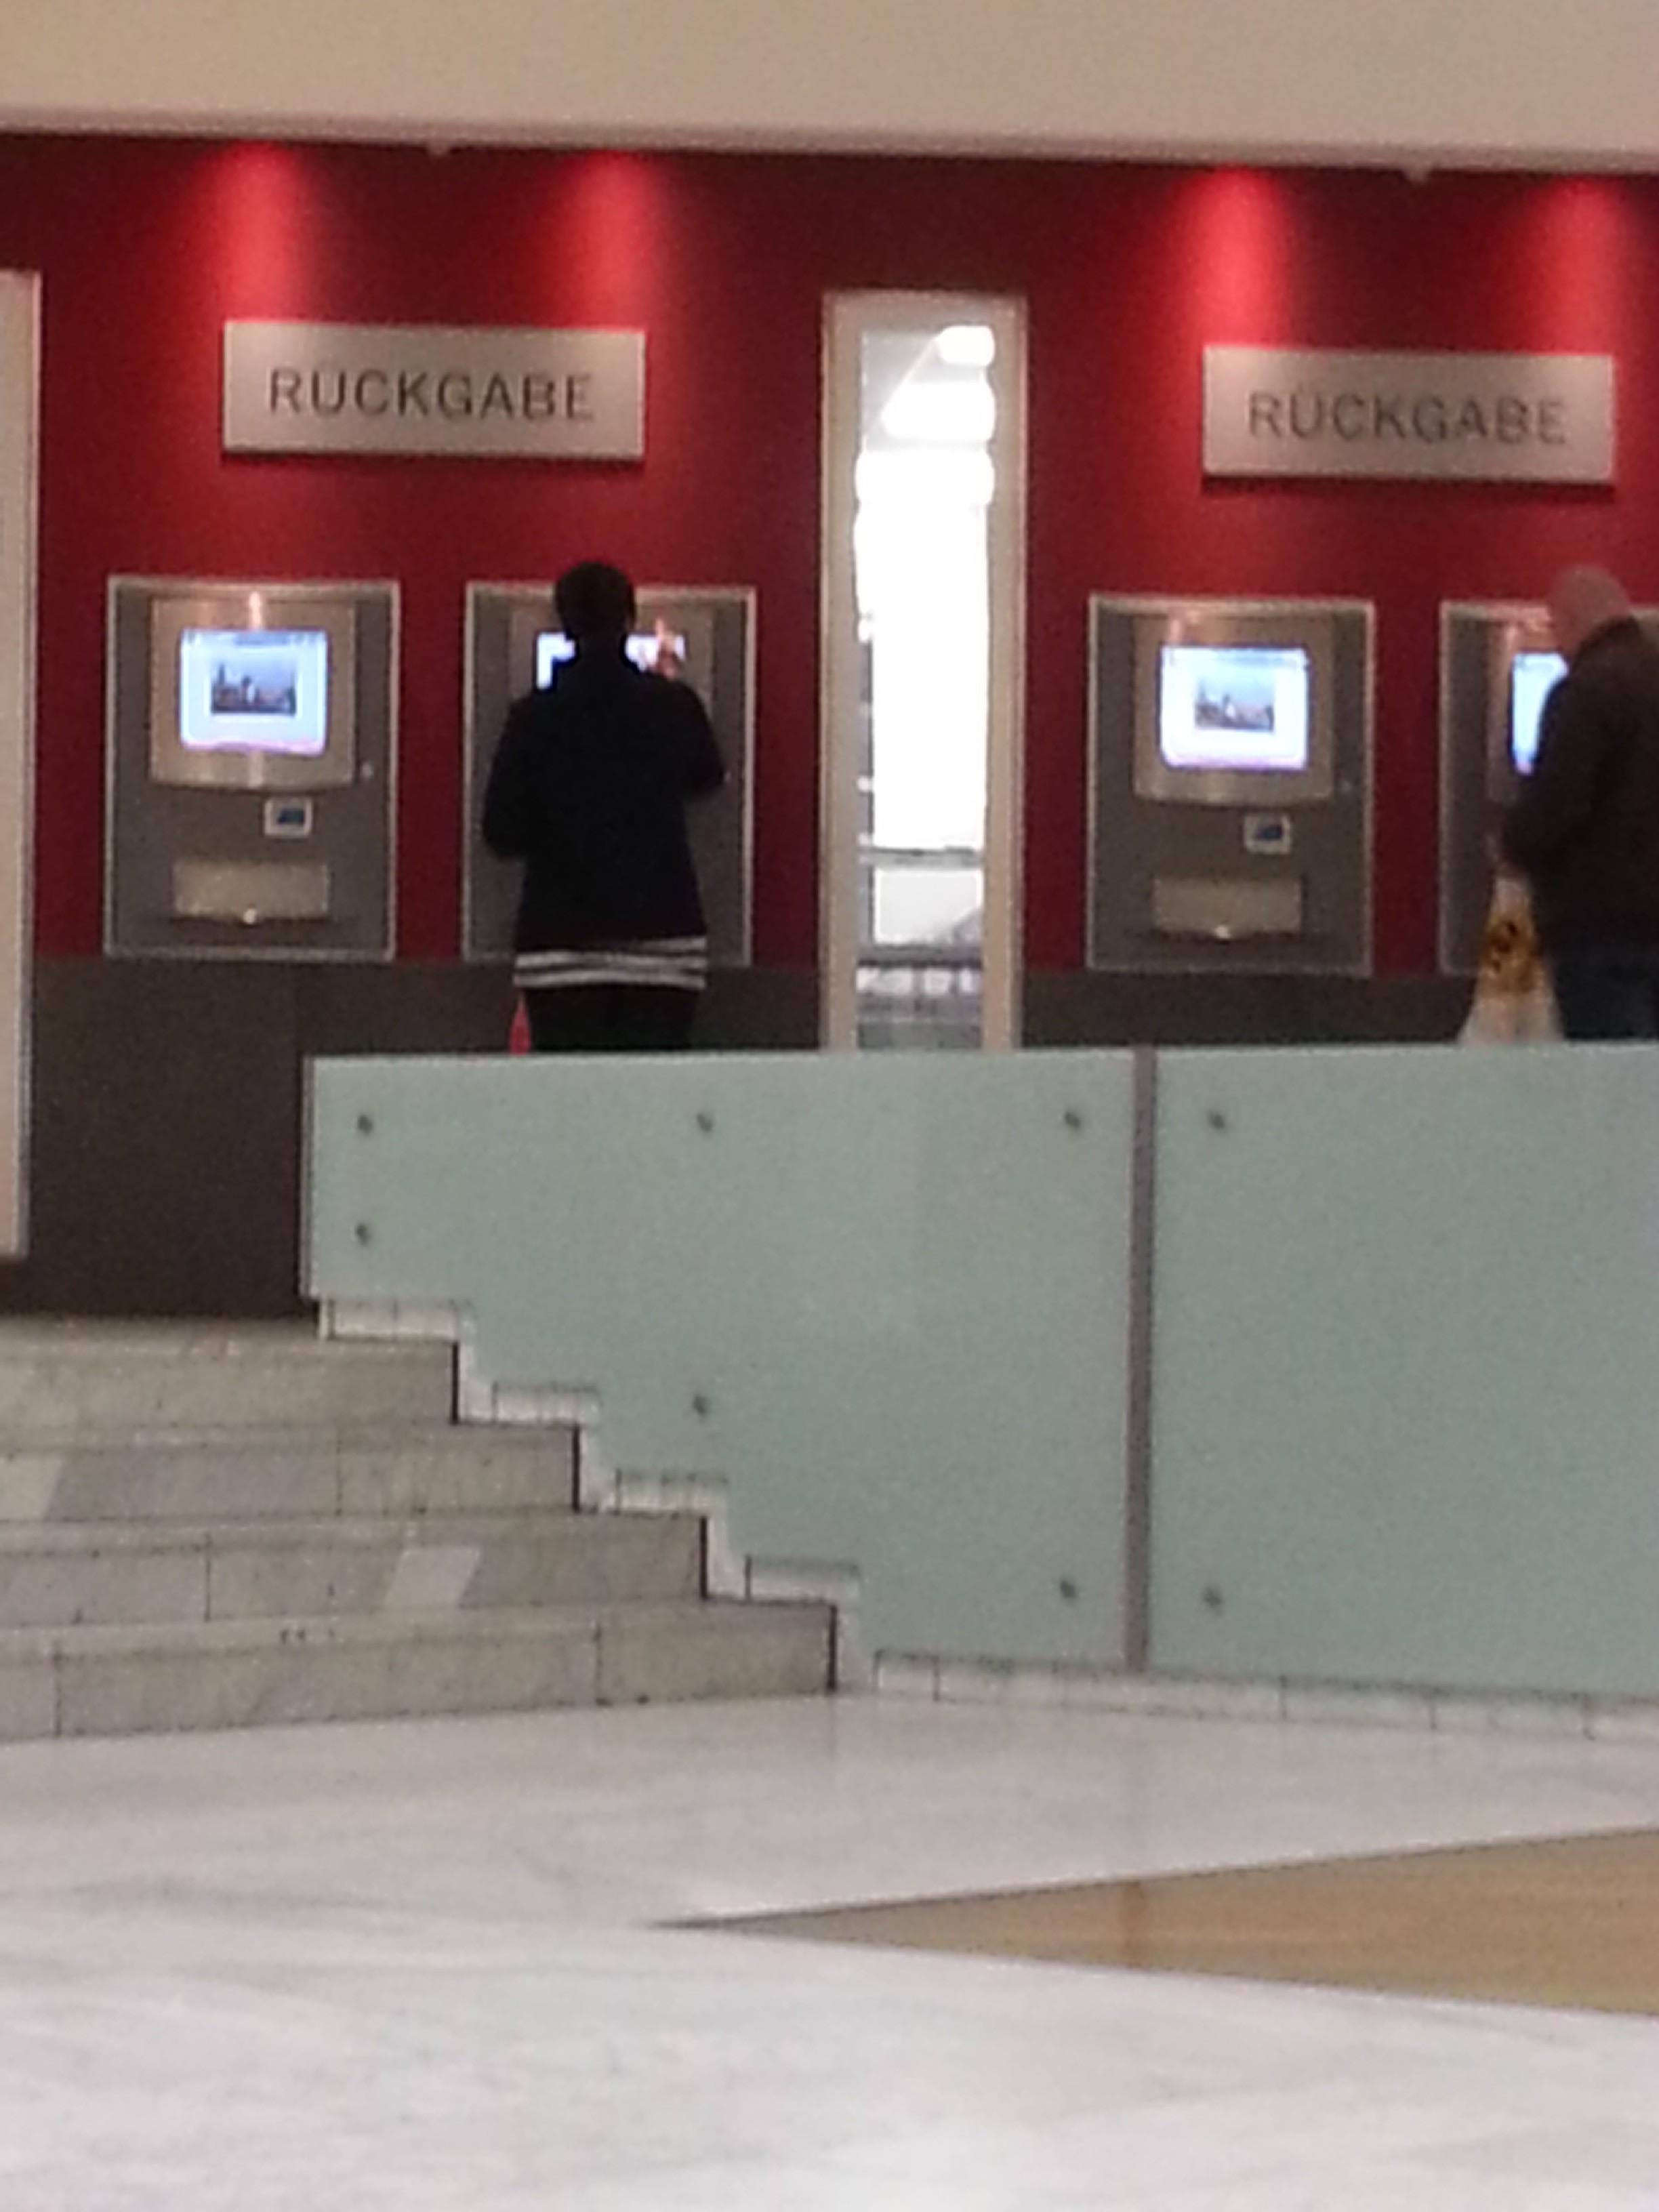 Düsseldorfer Stadtbücherei - Rückgabeautomaten